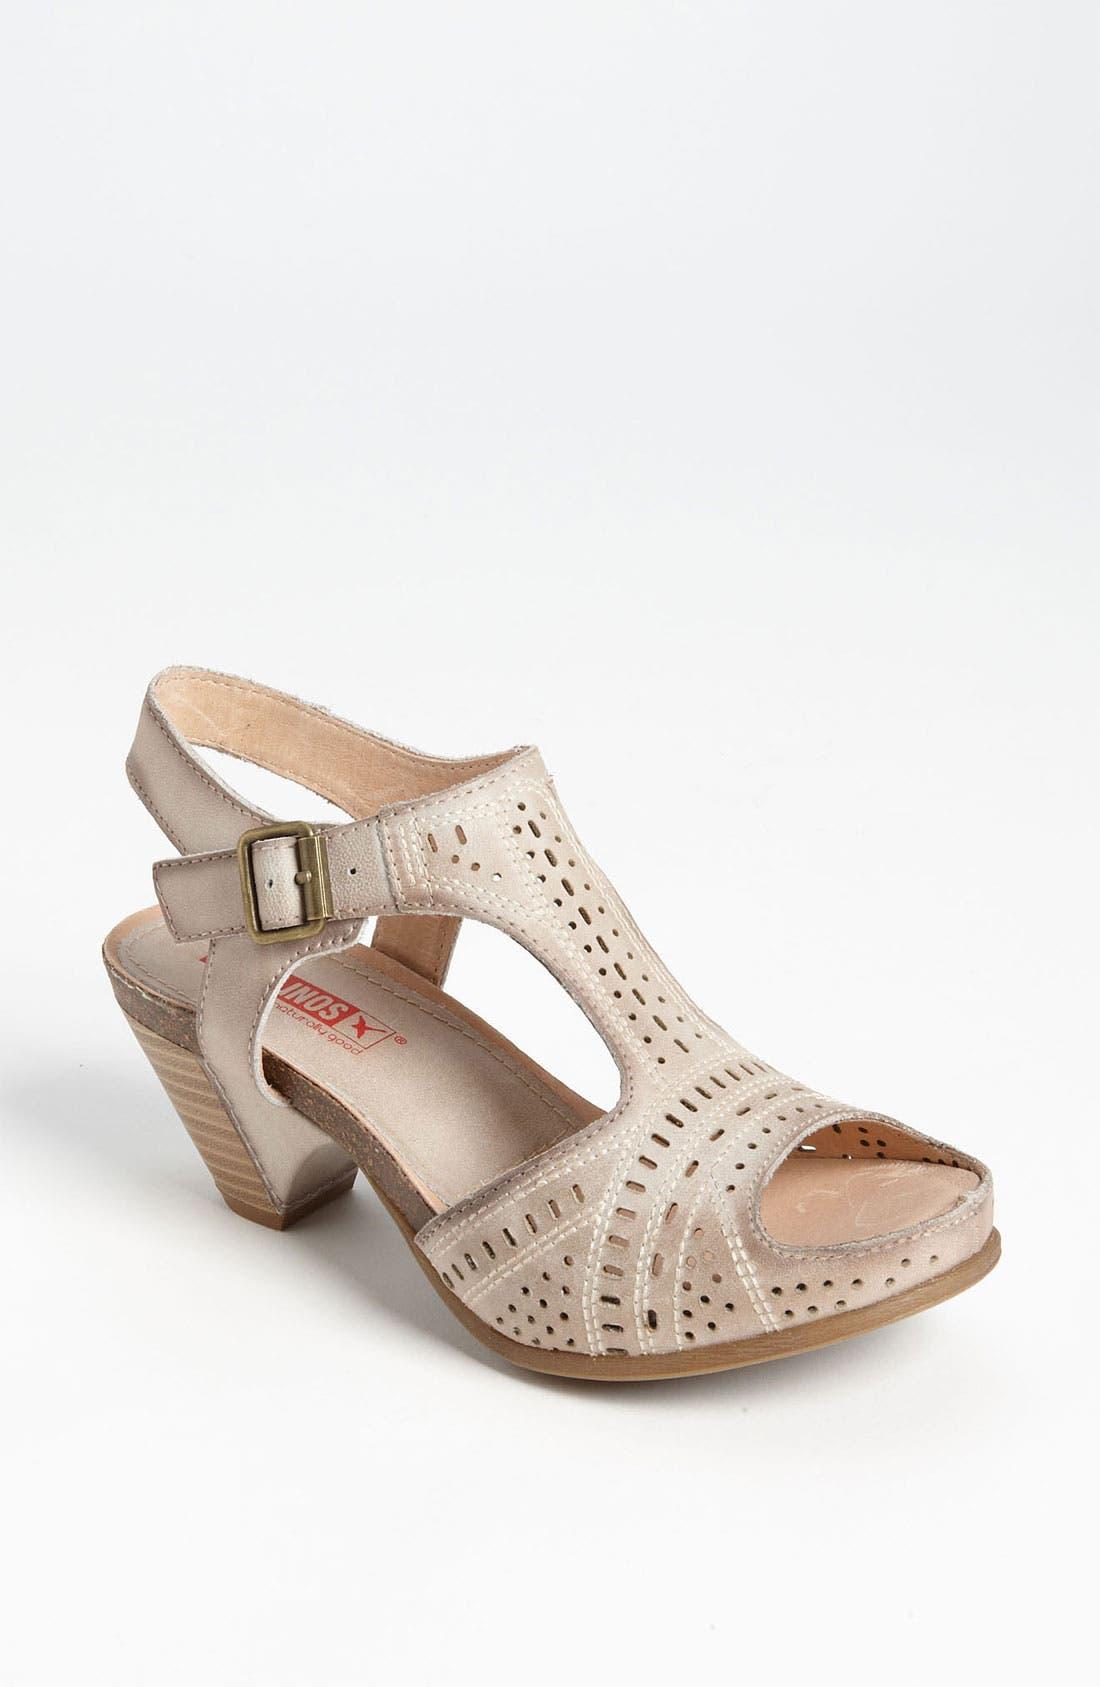 Alternate Image 1 Selected - PIKOLINOS 'Moraira' Sandal